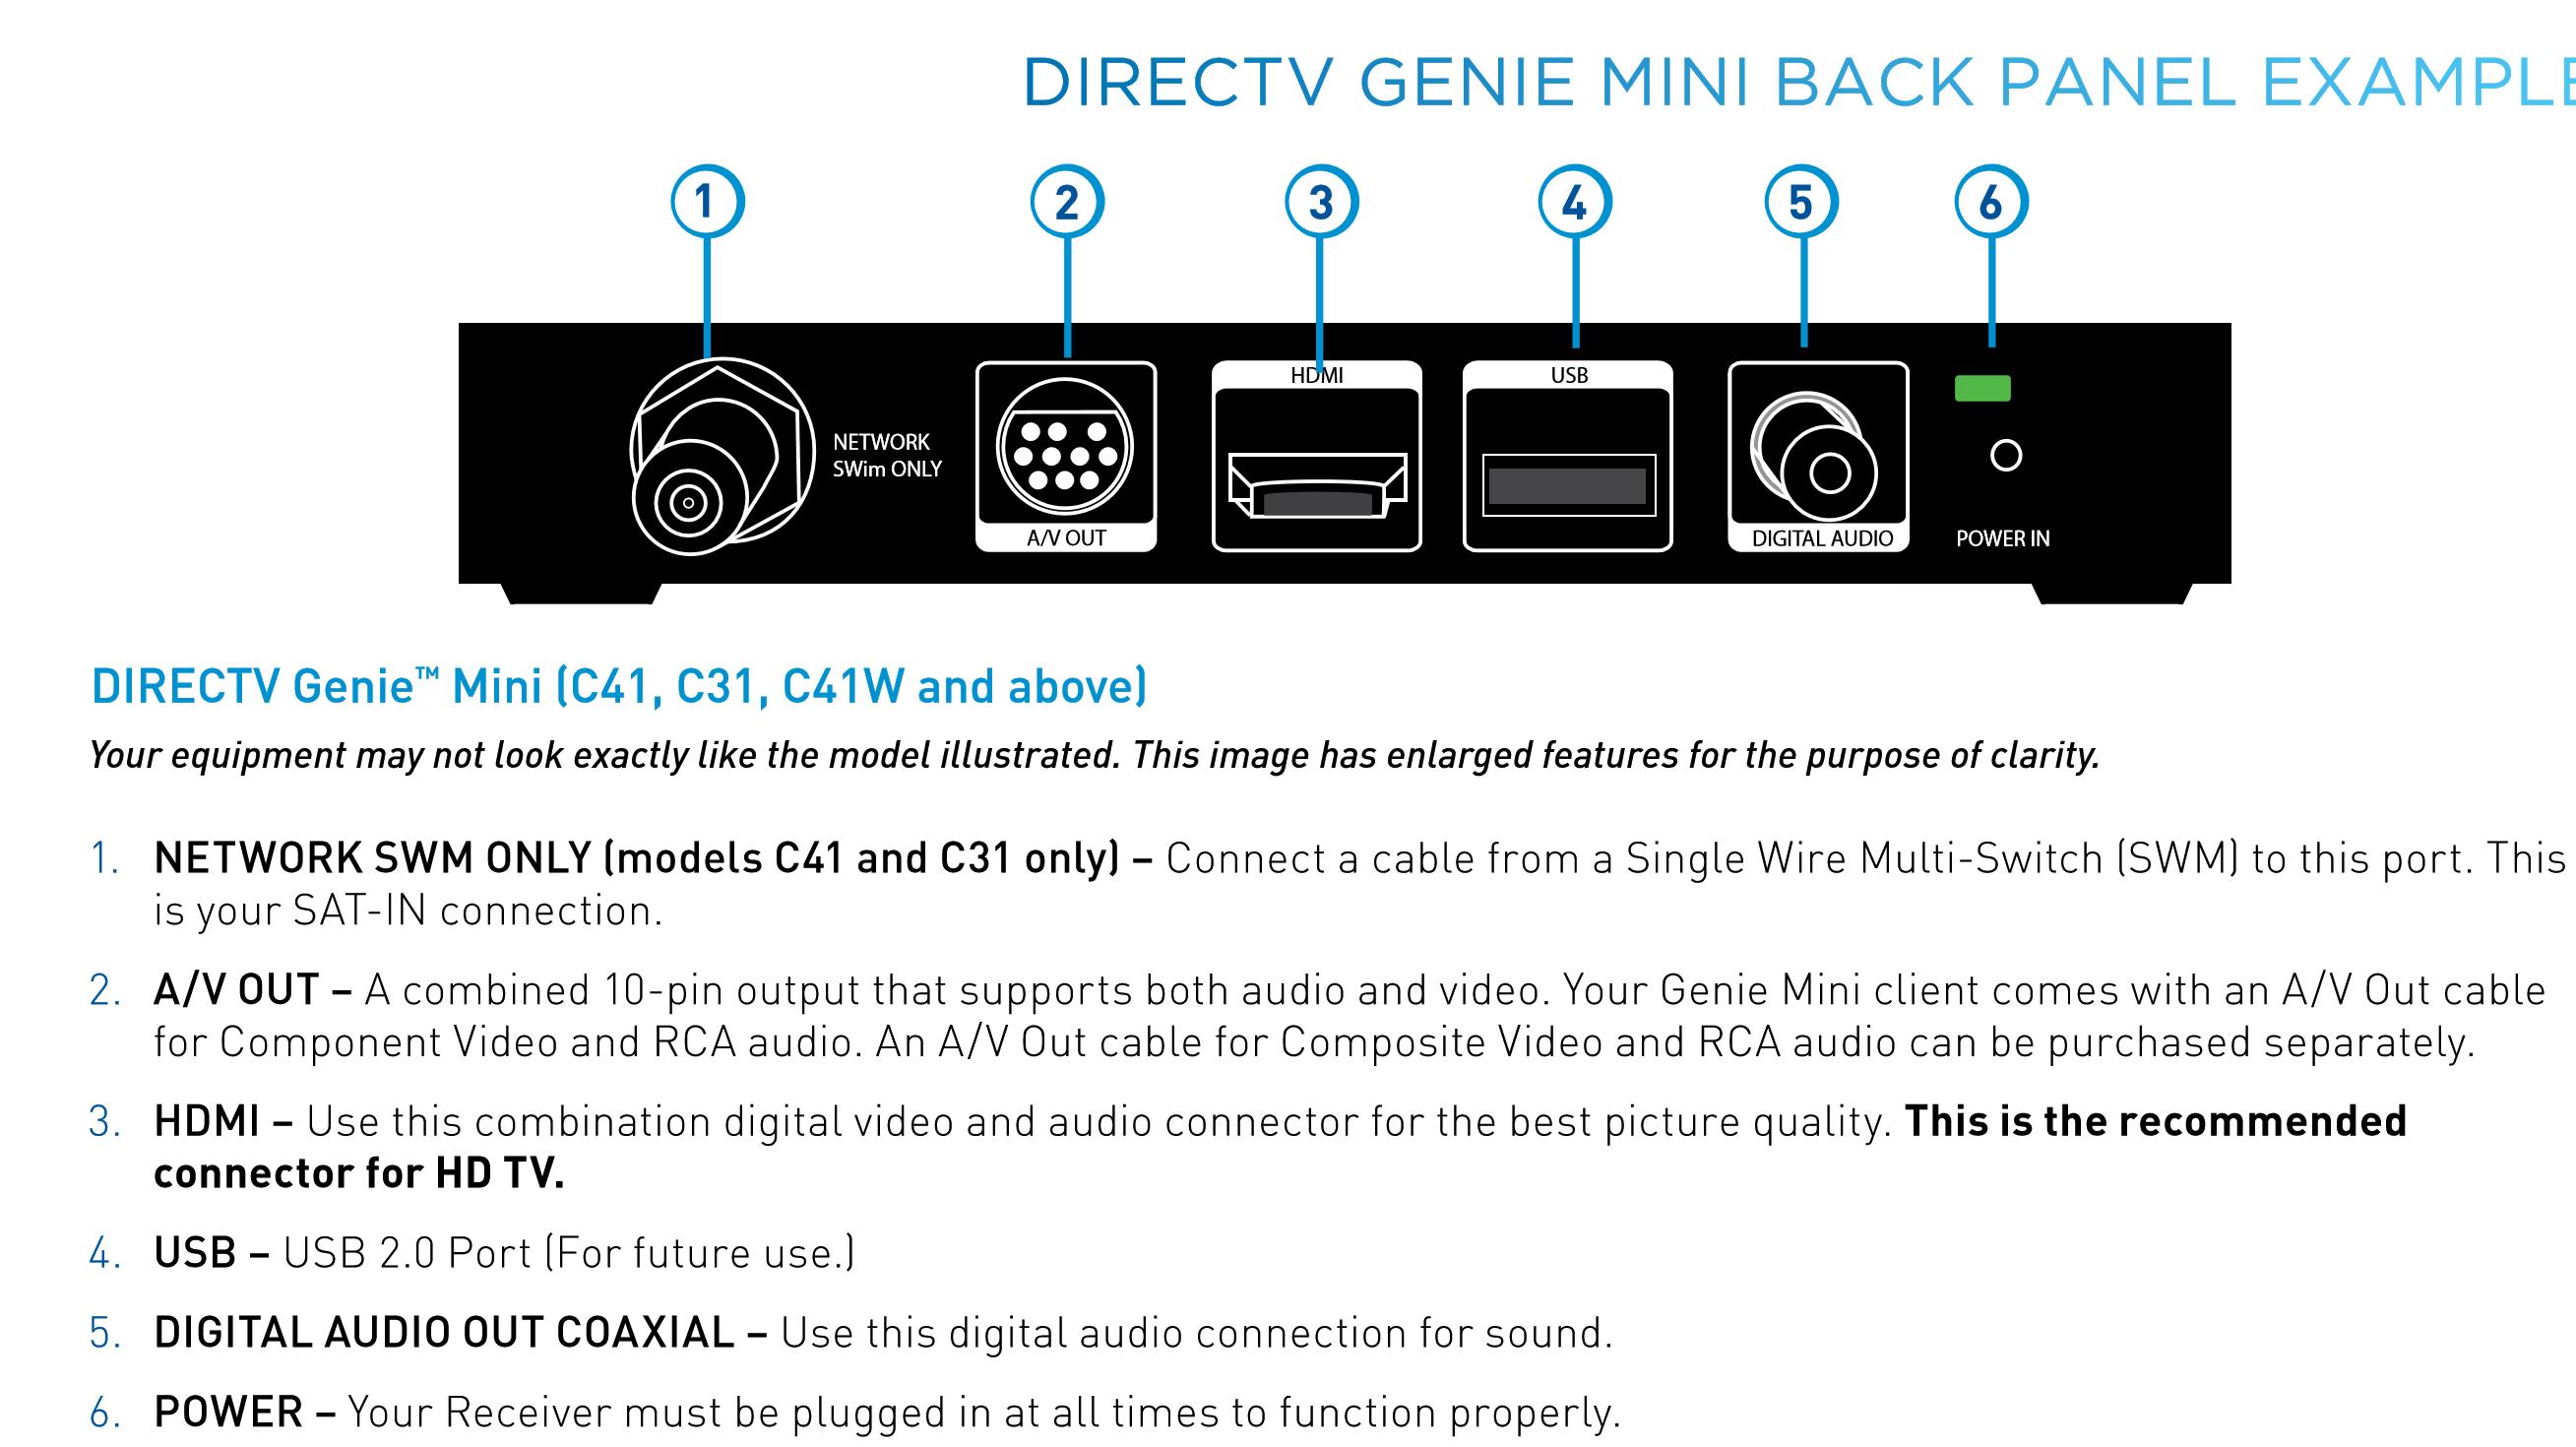 Diagram In Pictures Database Directv Genie Mini C41w Wiring Diagram Just Download Or Read Wiring Diagram Online Casalamm Edu Mx